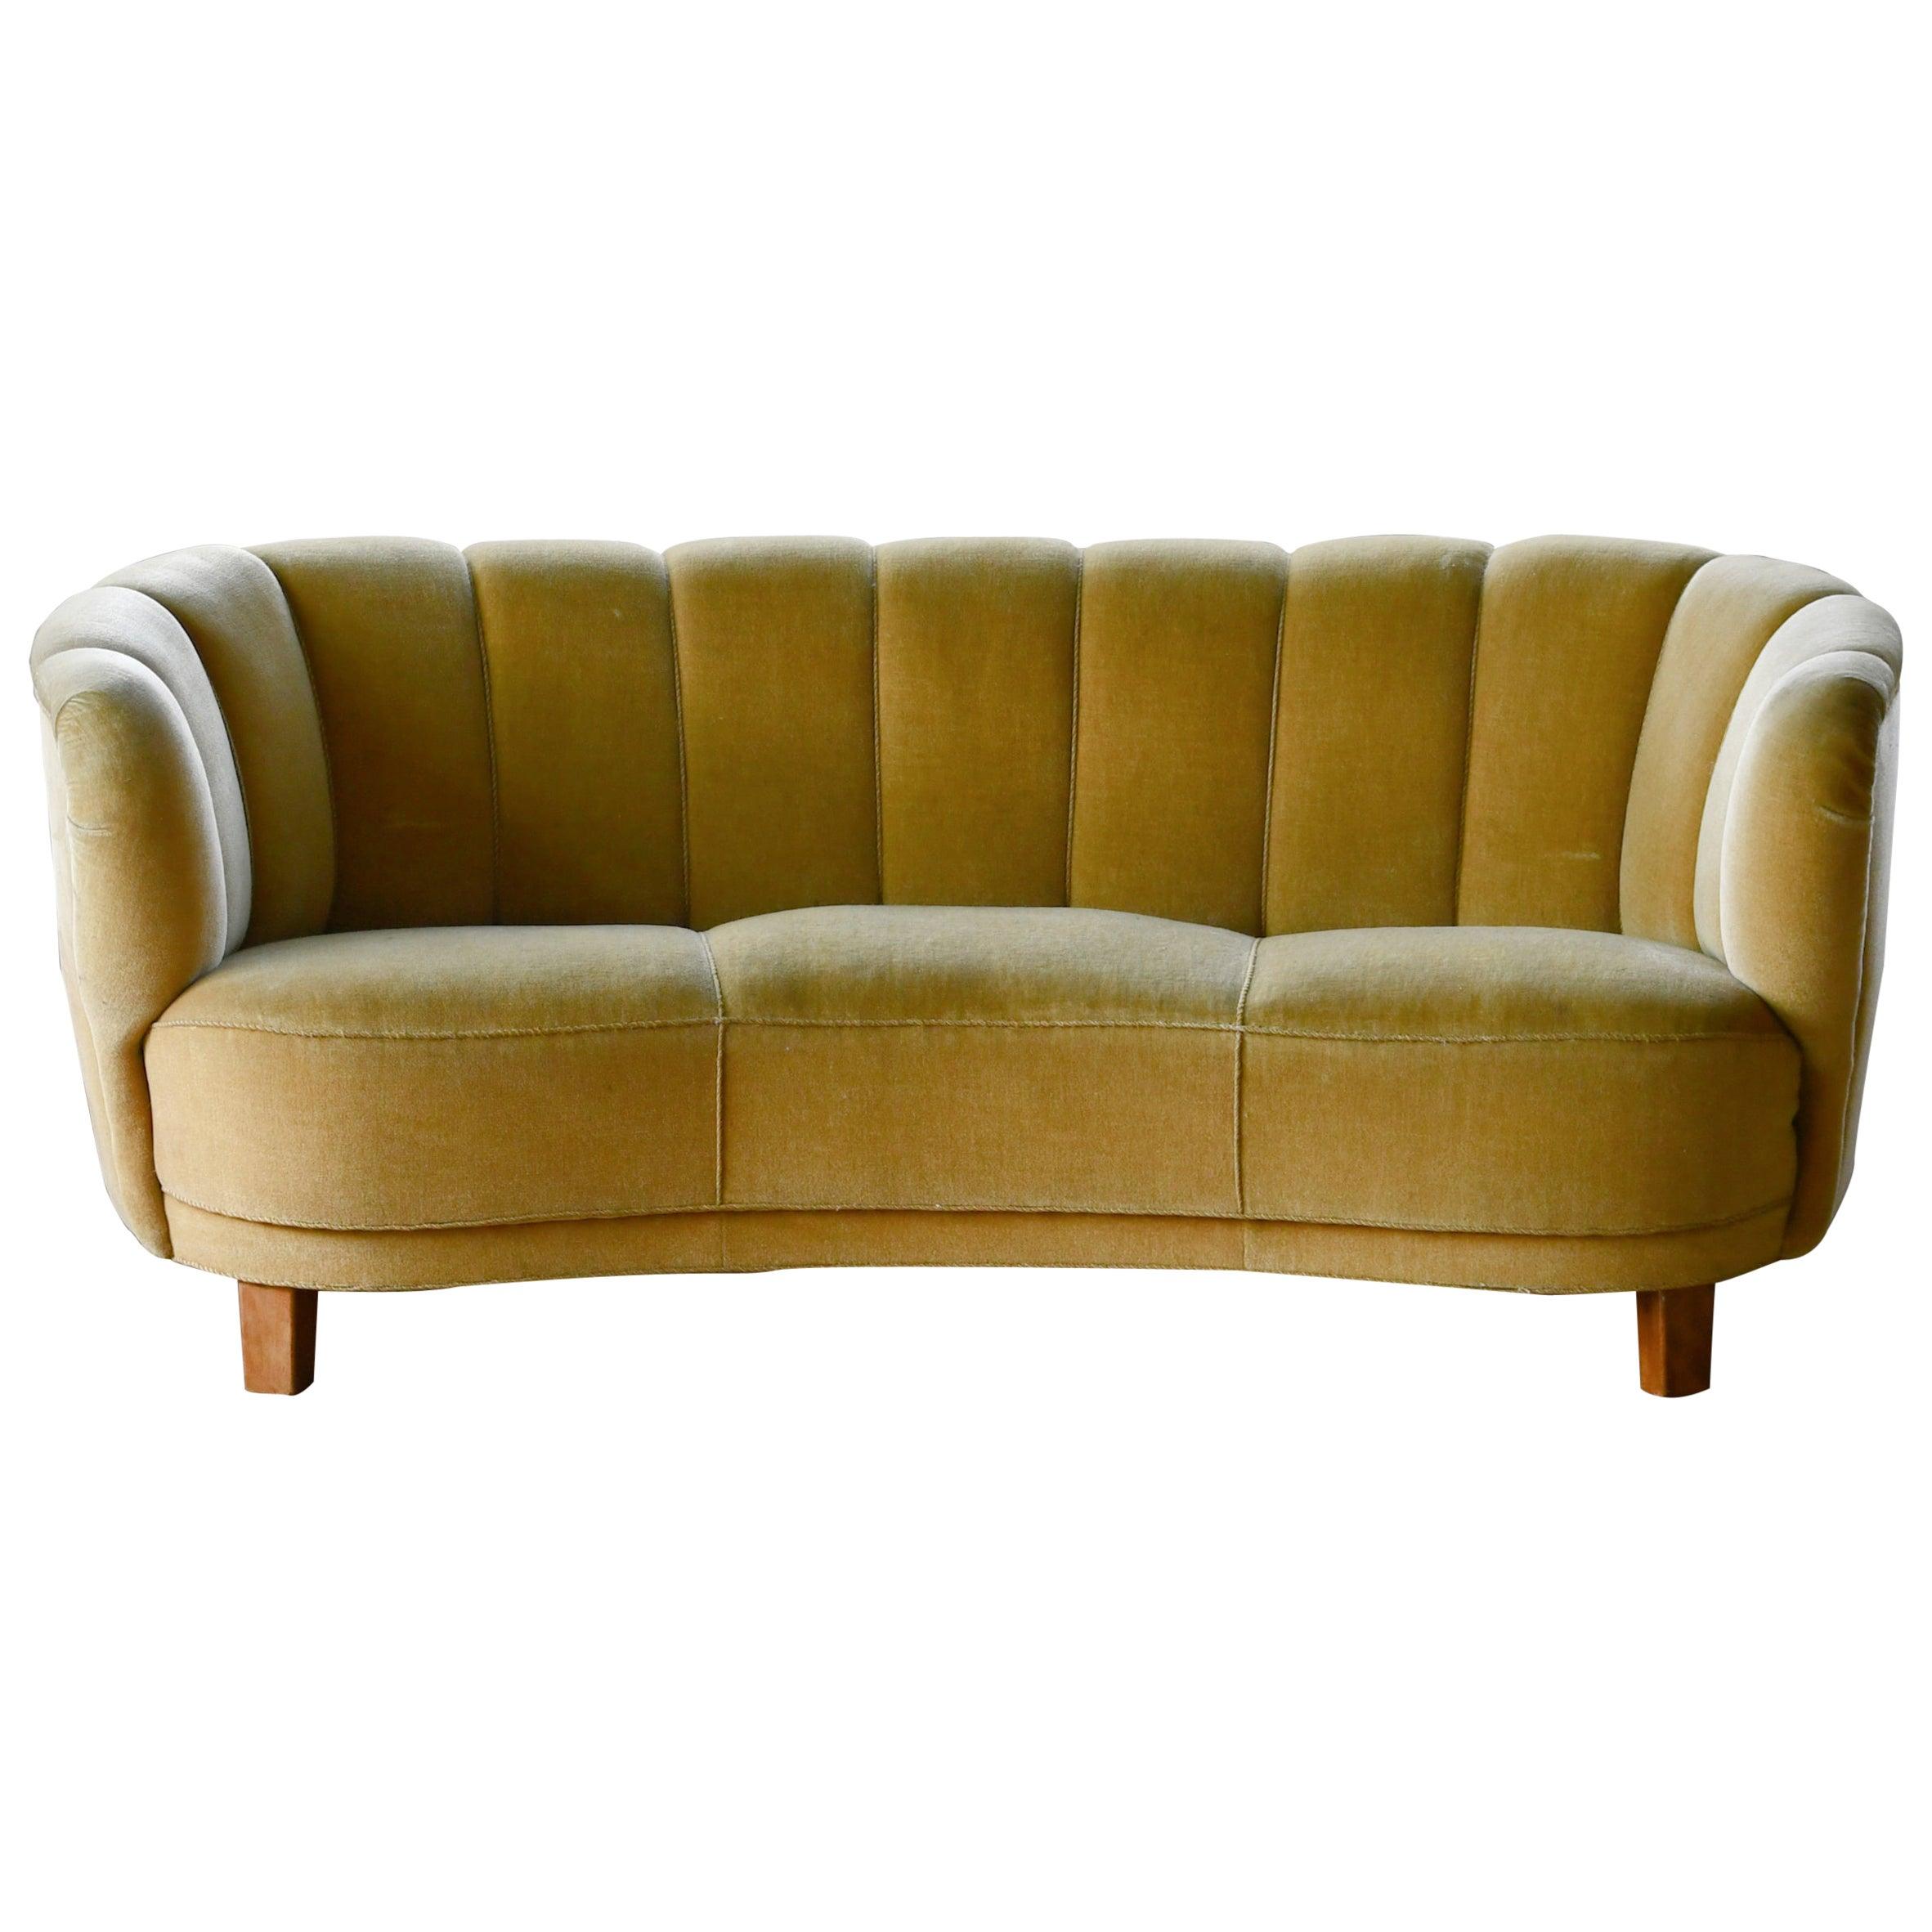 Danish Banana Form Curved Sofa in Original Golden Green Mohair, 1940s